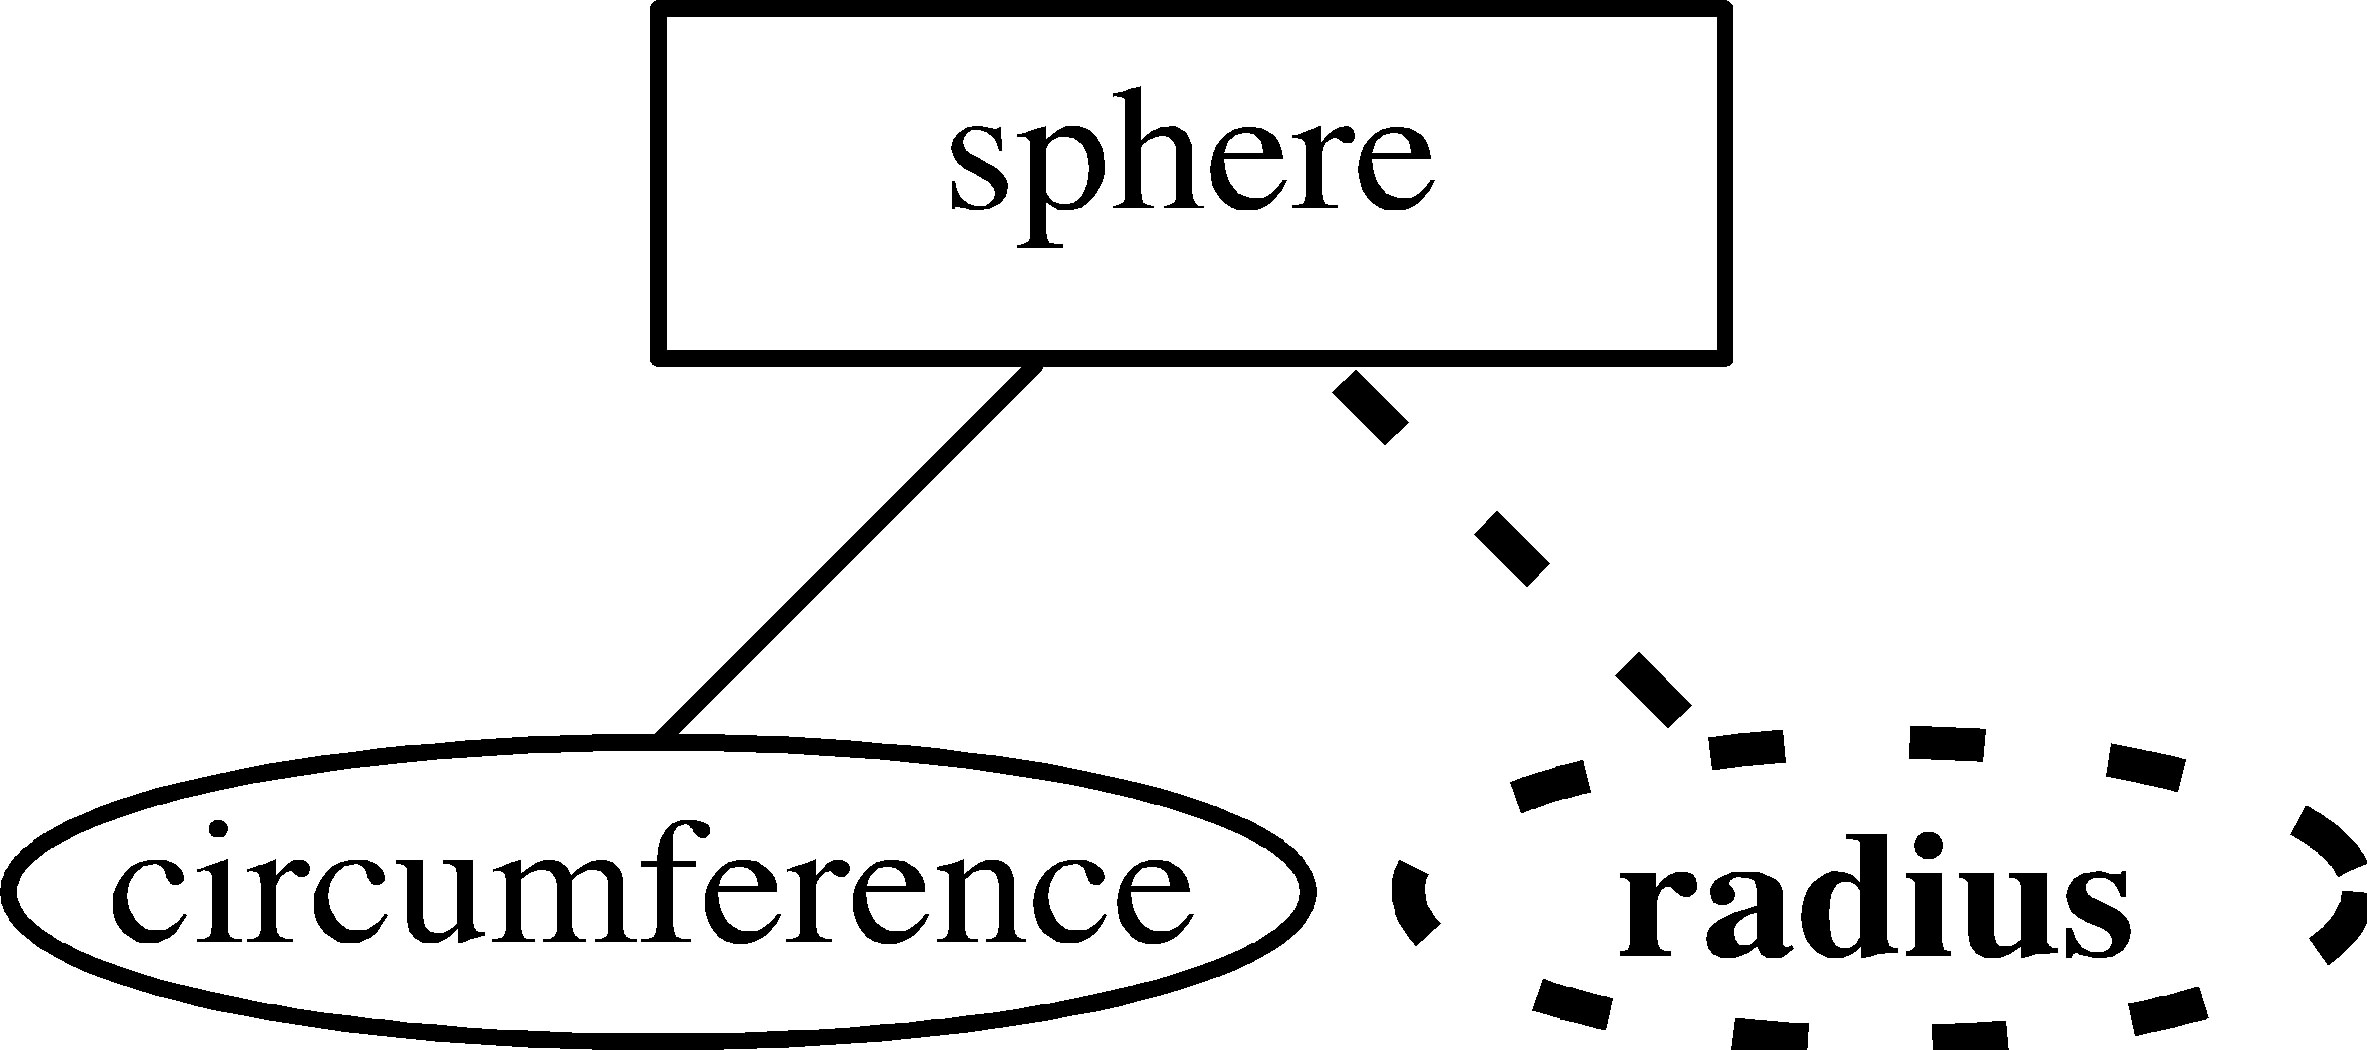 Entity-Relationship Model inside Er Diagram Double Circle